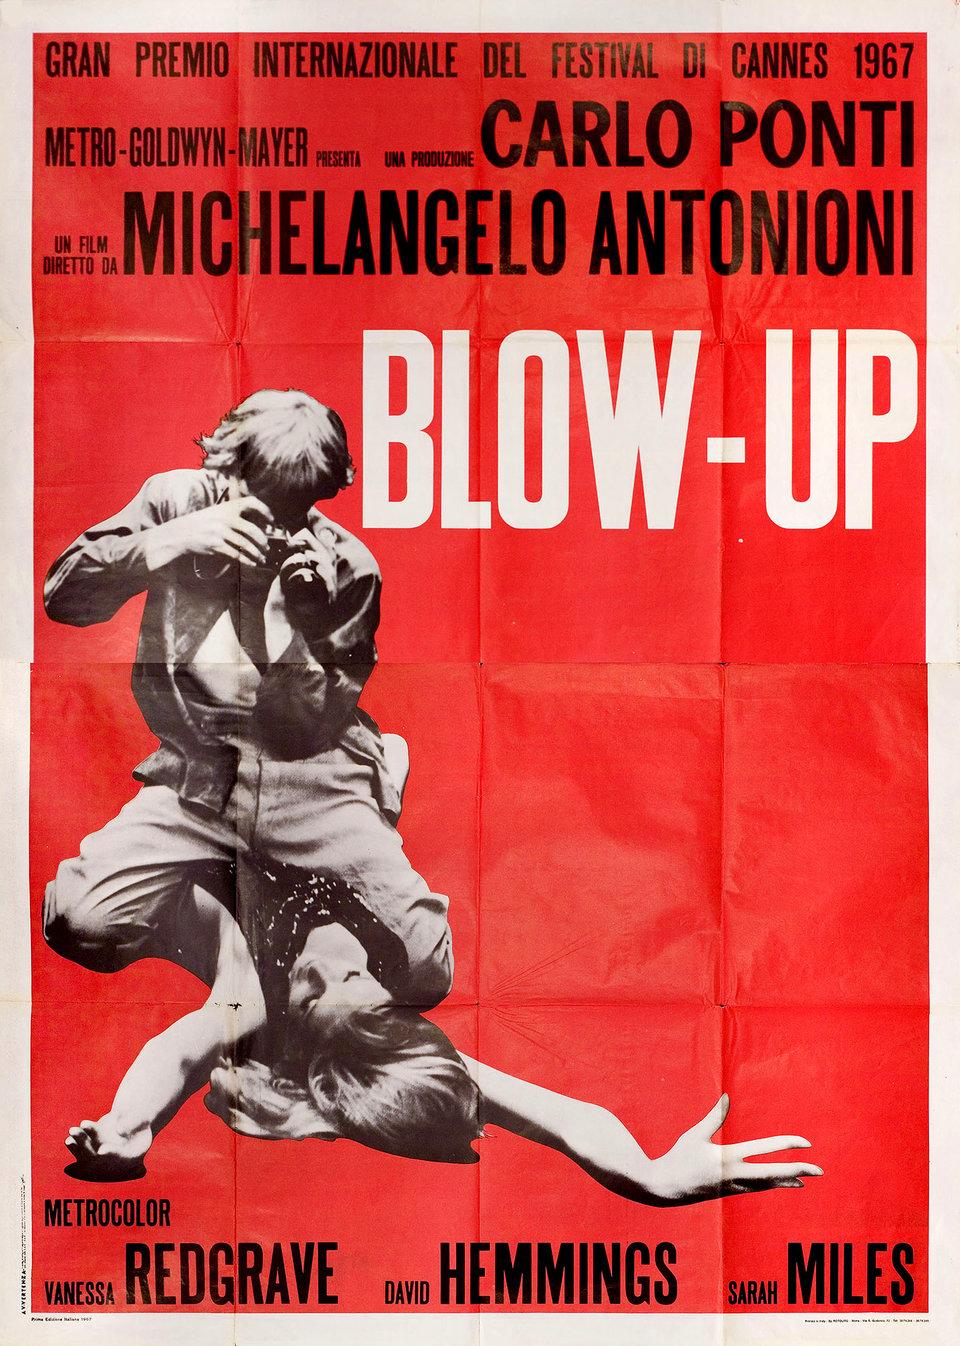 Blow-Up 1967 Italian Quattro Fogli Poster